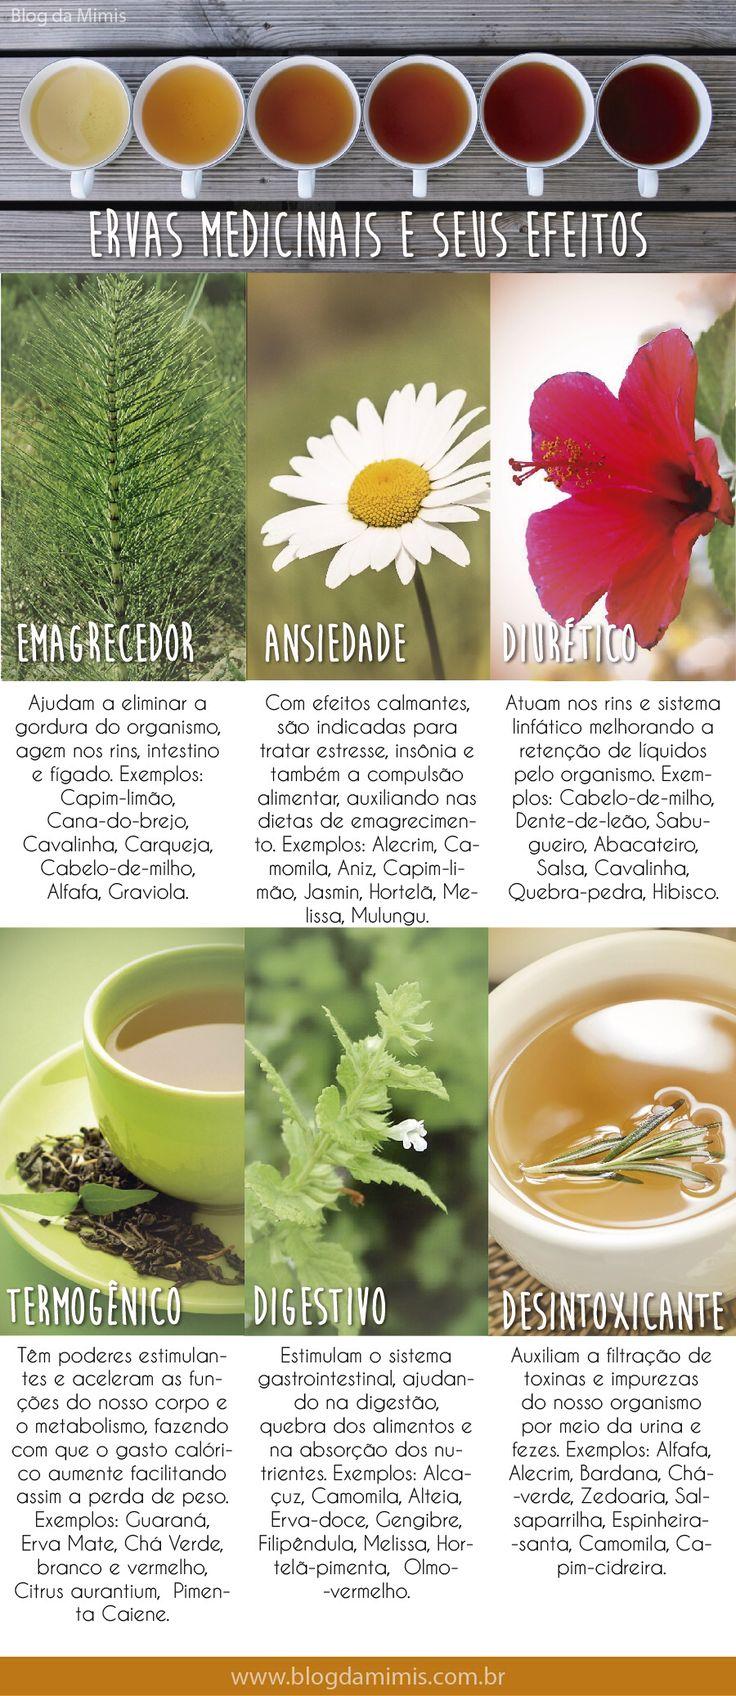 # vida saudável